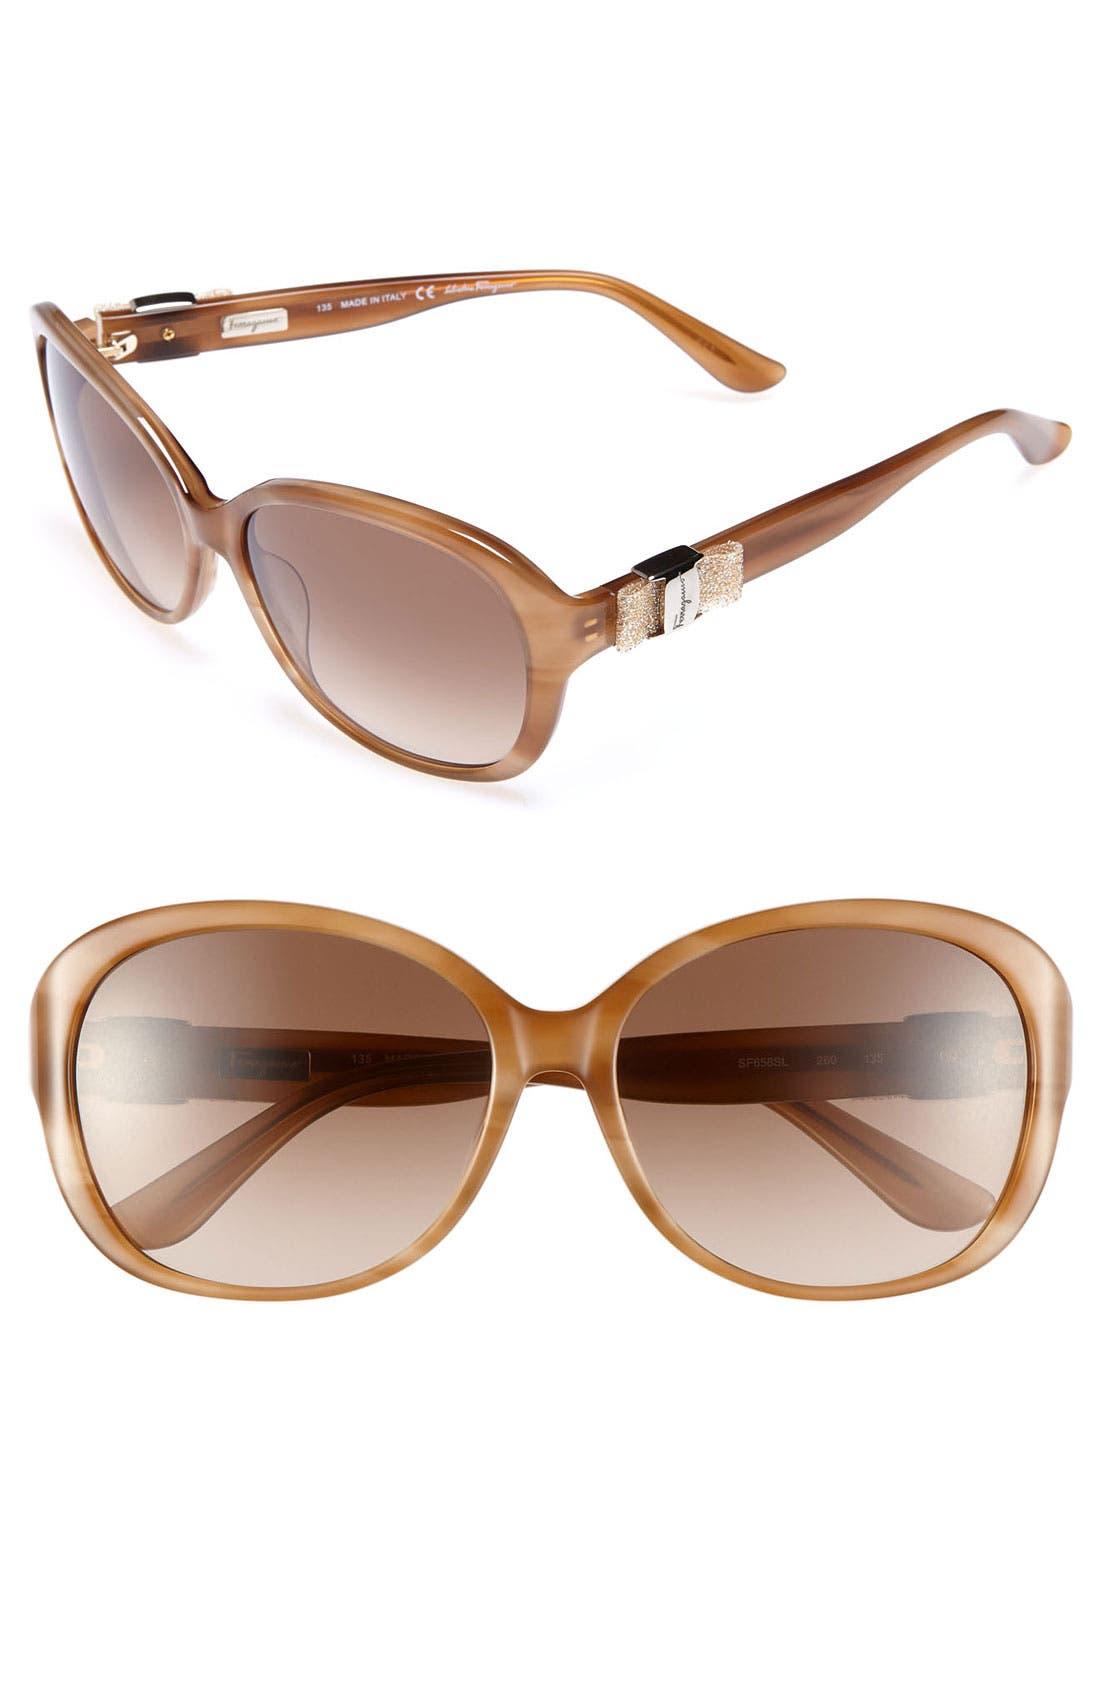 Main Image - Salvatore Ferragamo Oversized Sunglasses